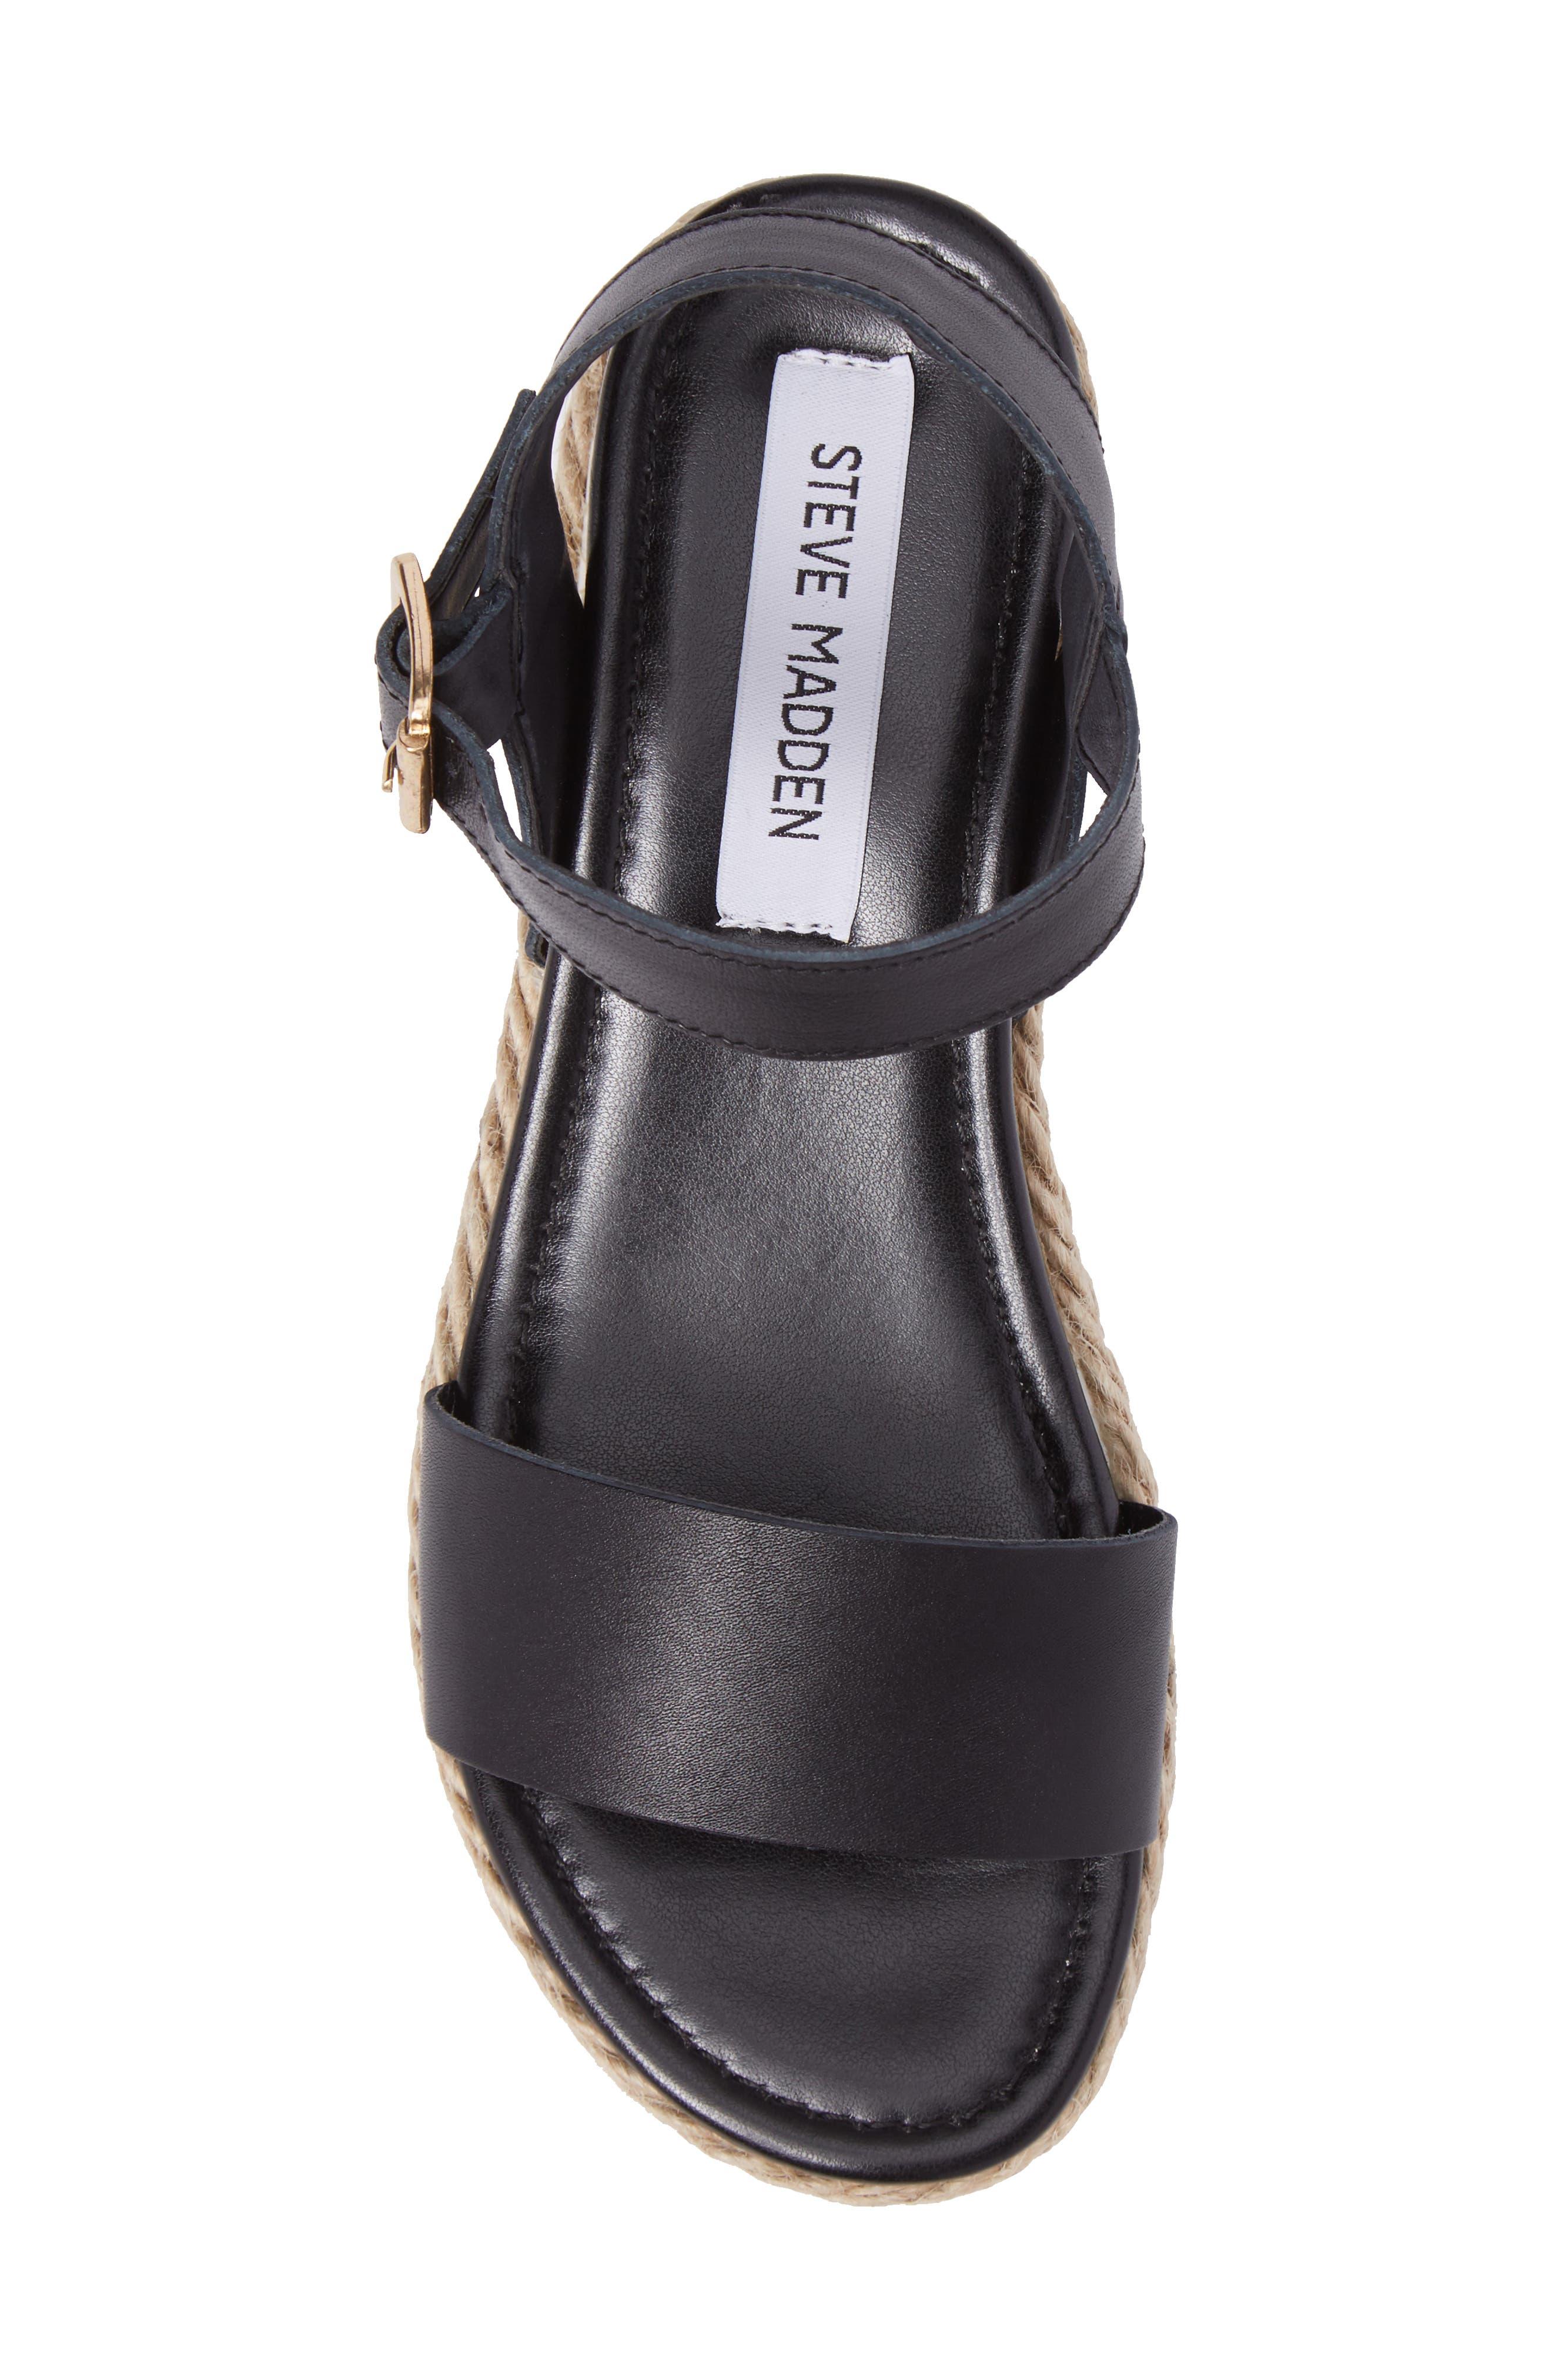 Chiara Platform Espadrille Sandal,                             Alternate thumbnail 5, color,                             Black Leather